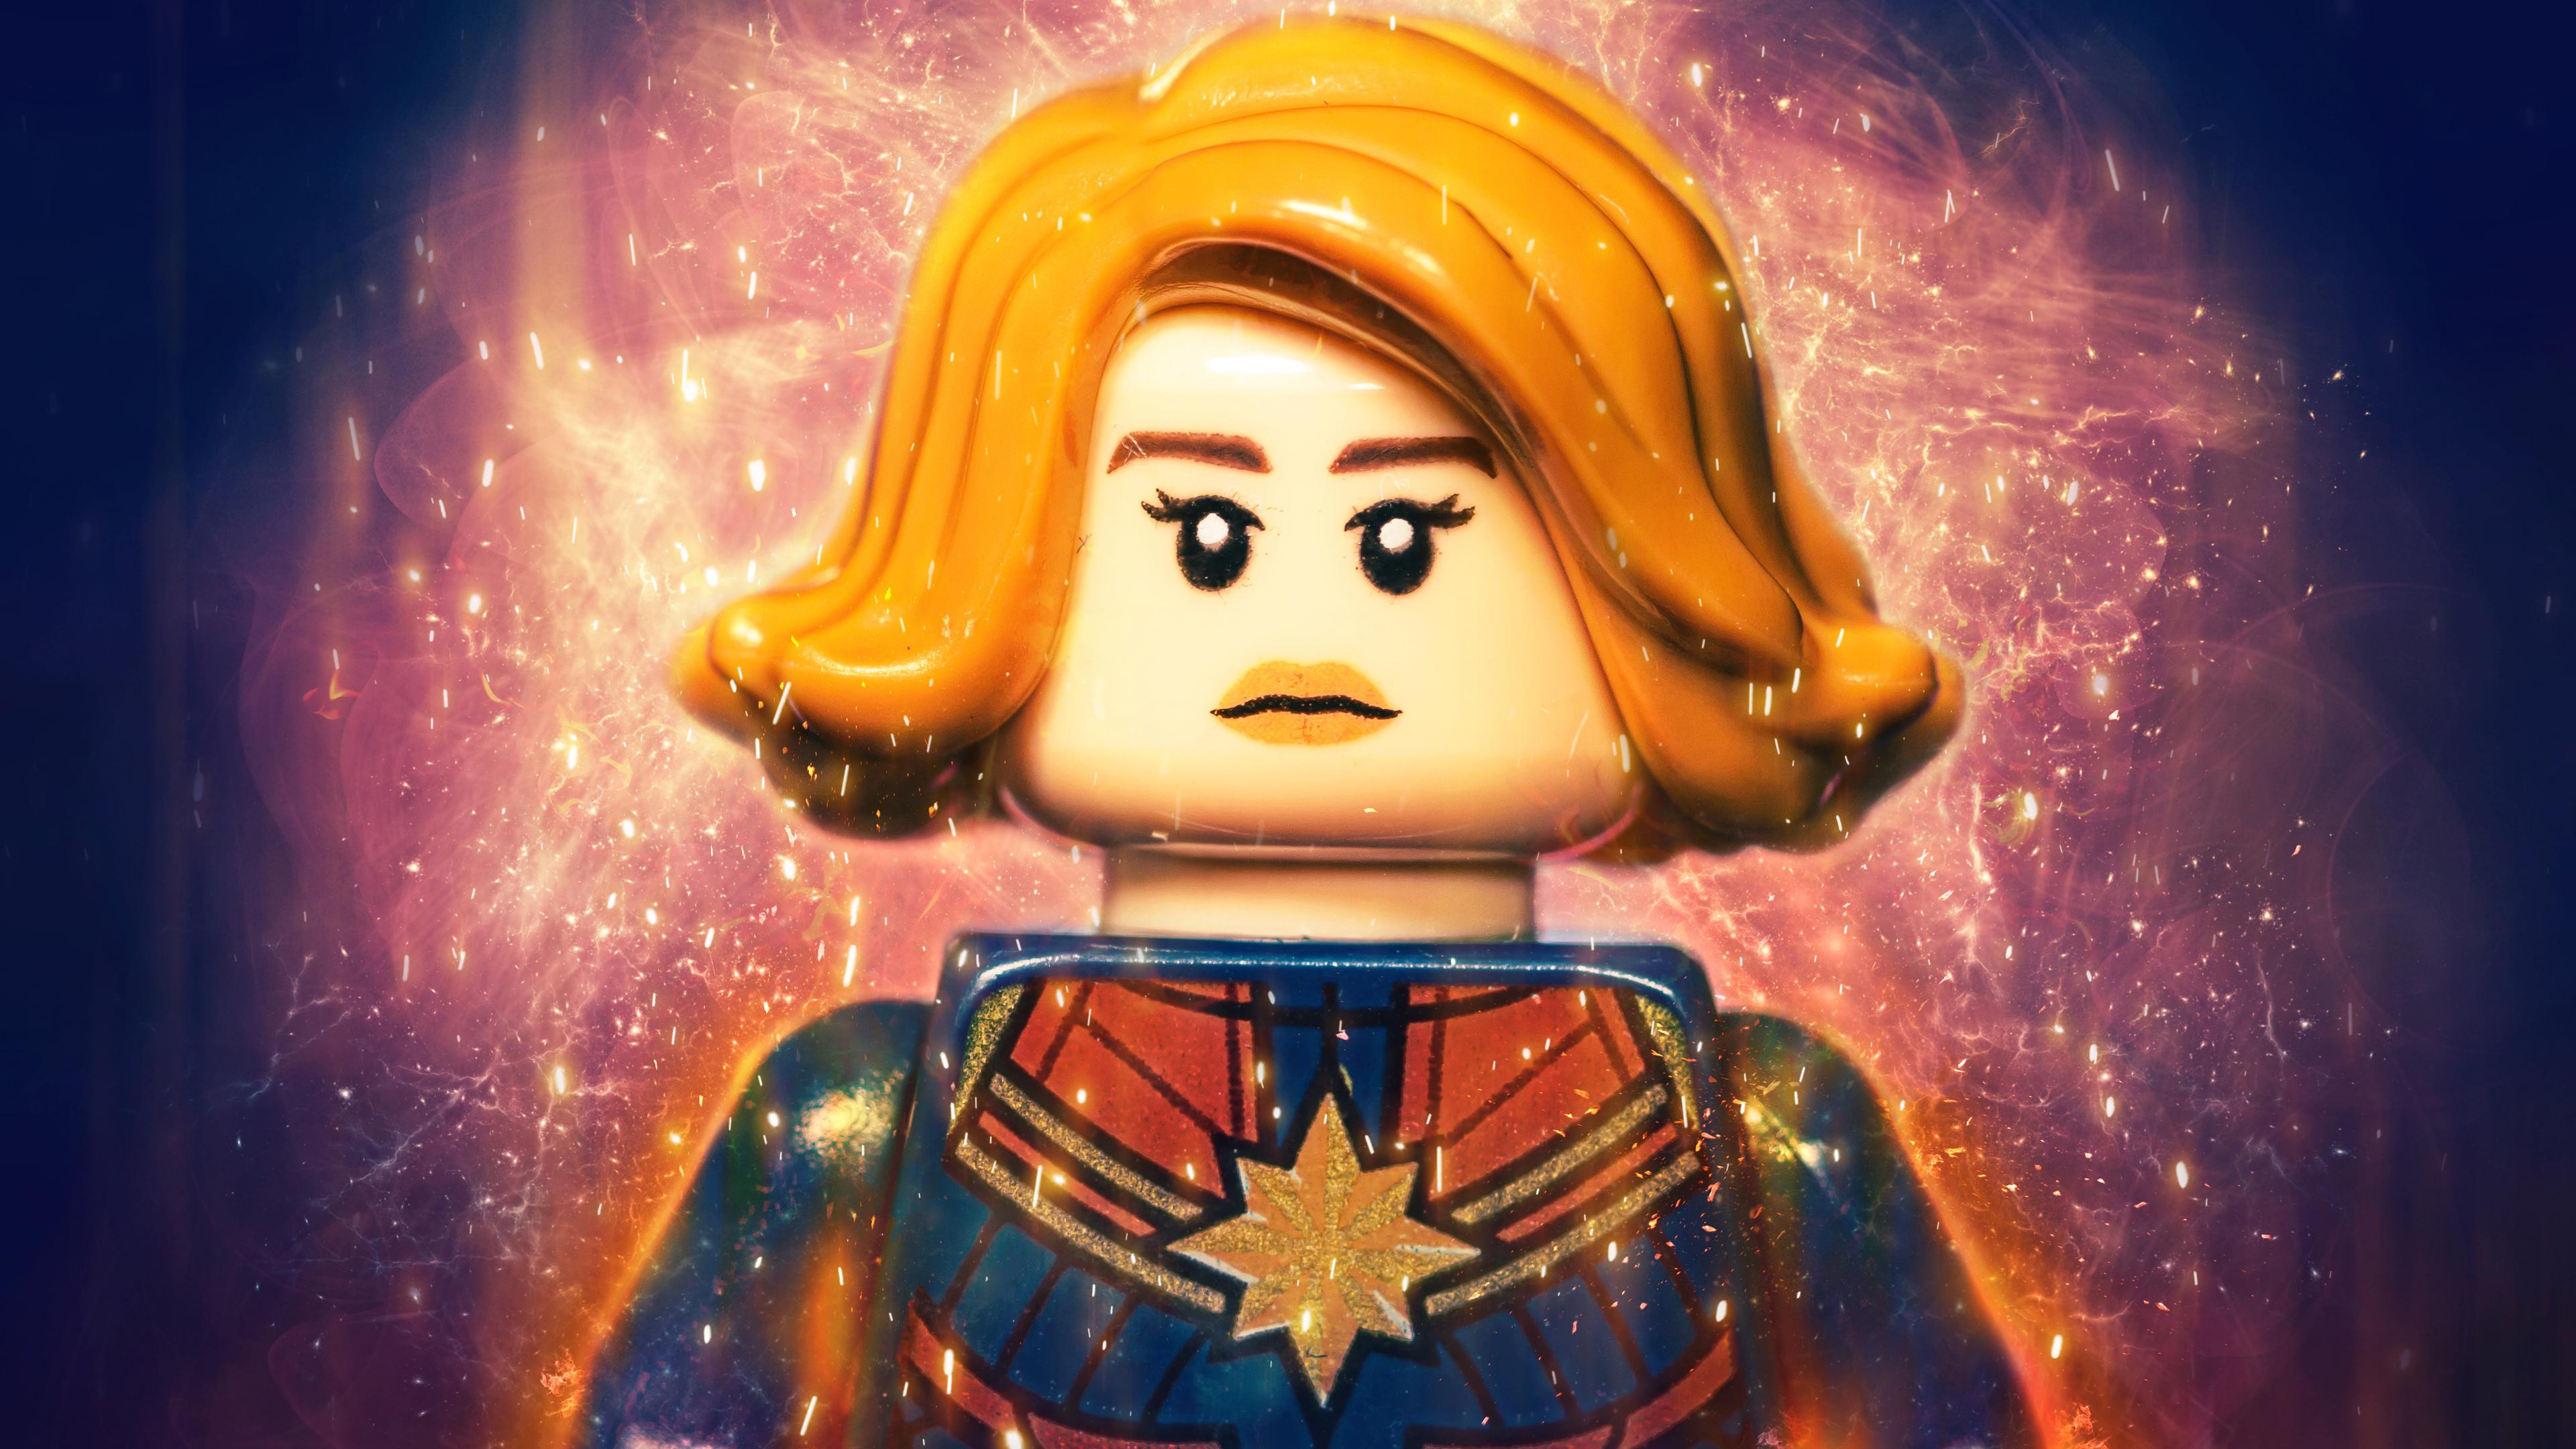 captain marvel lego 4k 1553071892 - Captain Marvel Lego 4k - superheroes wallpapers, lego wallpapers, hd-wallpapers, flickr wallpapers, captain marvel wallpapers, 4k-wallpapers